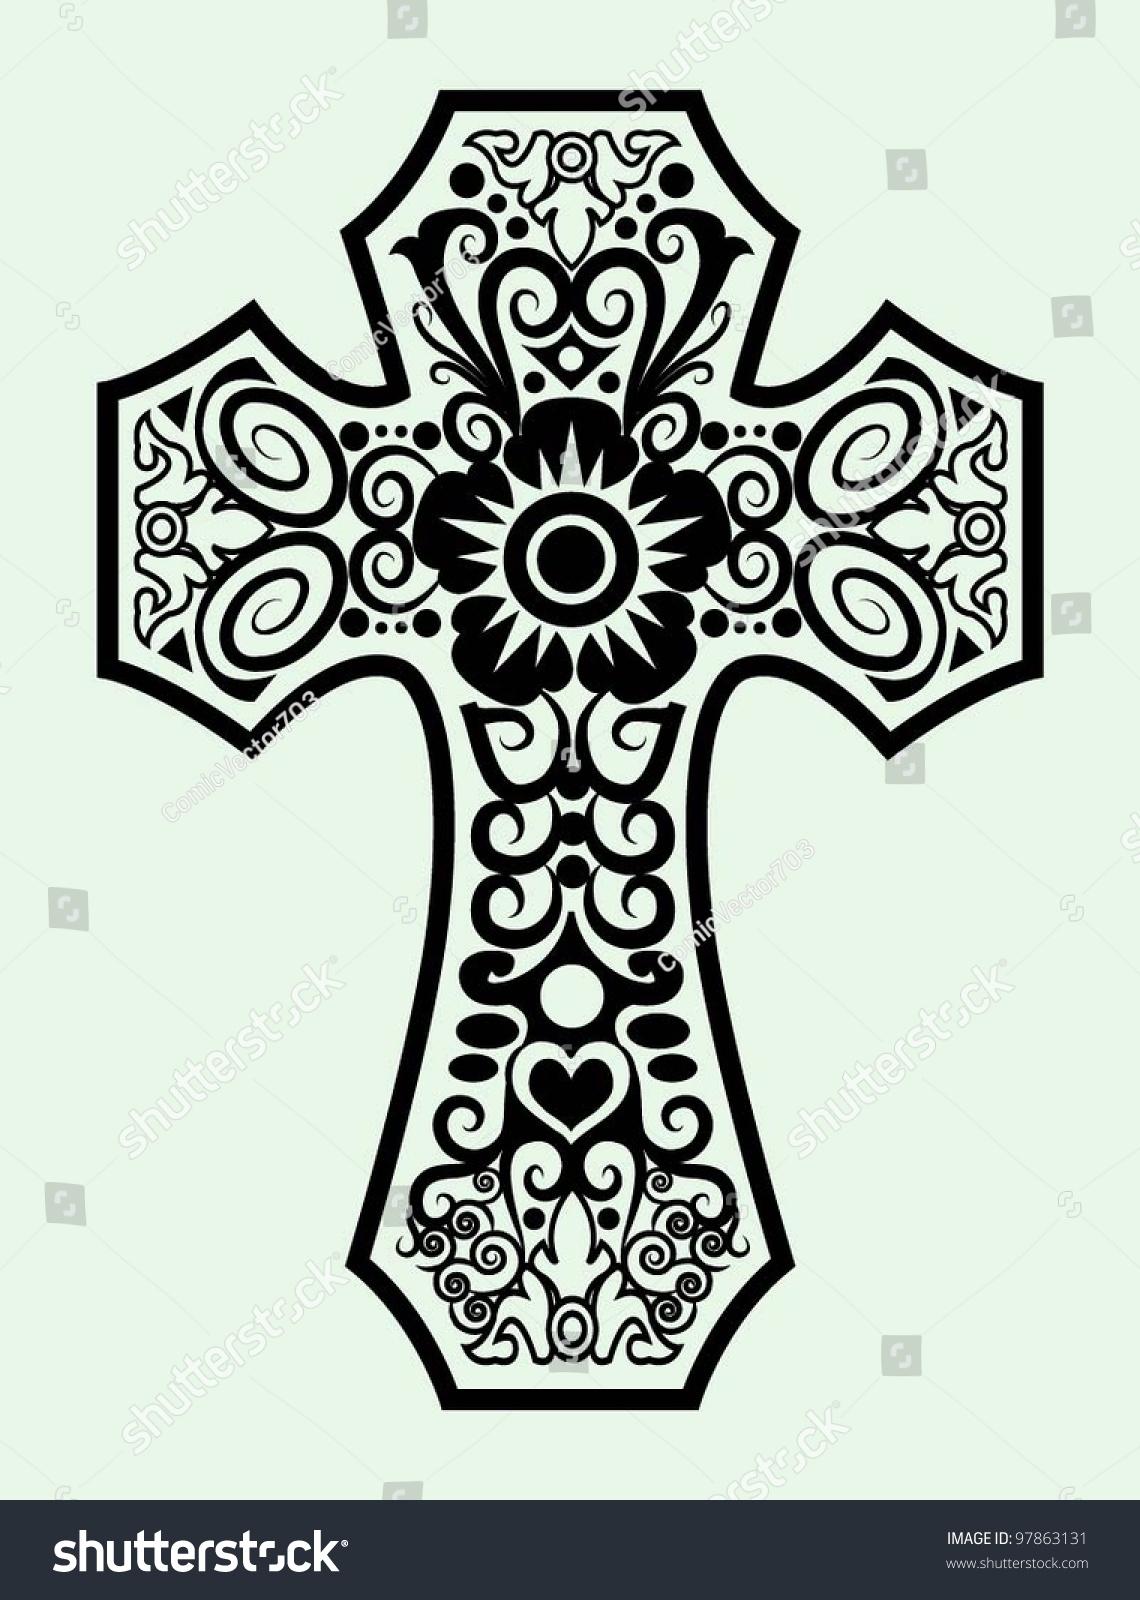 decorative cross ornament ink black and white drawing symbol - Decorative Cross